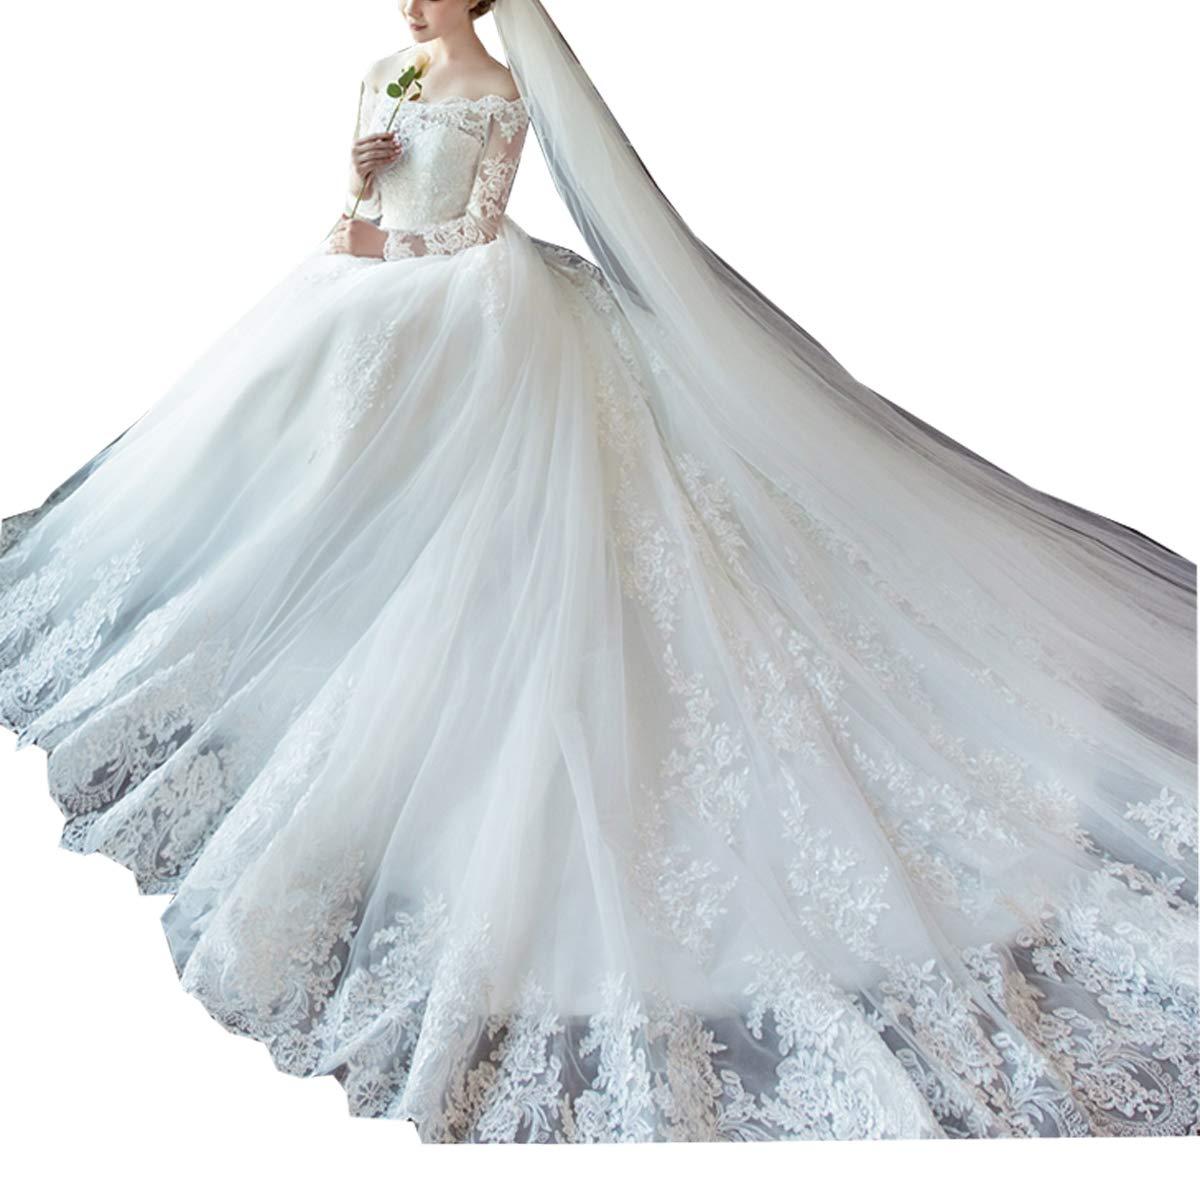 GFDress Womens Off Shoulder Long Sleeves Wedding Dress Brial Gowns Ourdoor Dress Elegant Church Ball Gowns